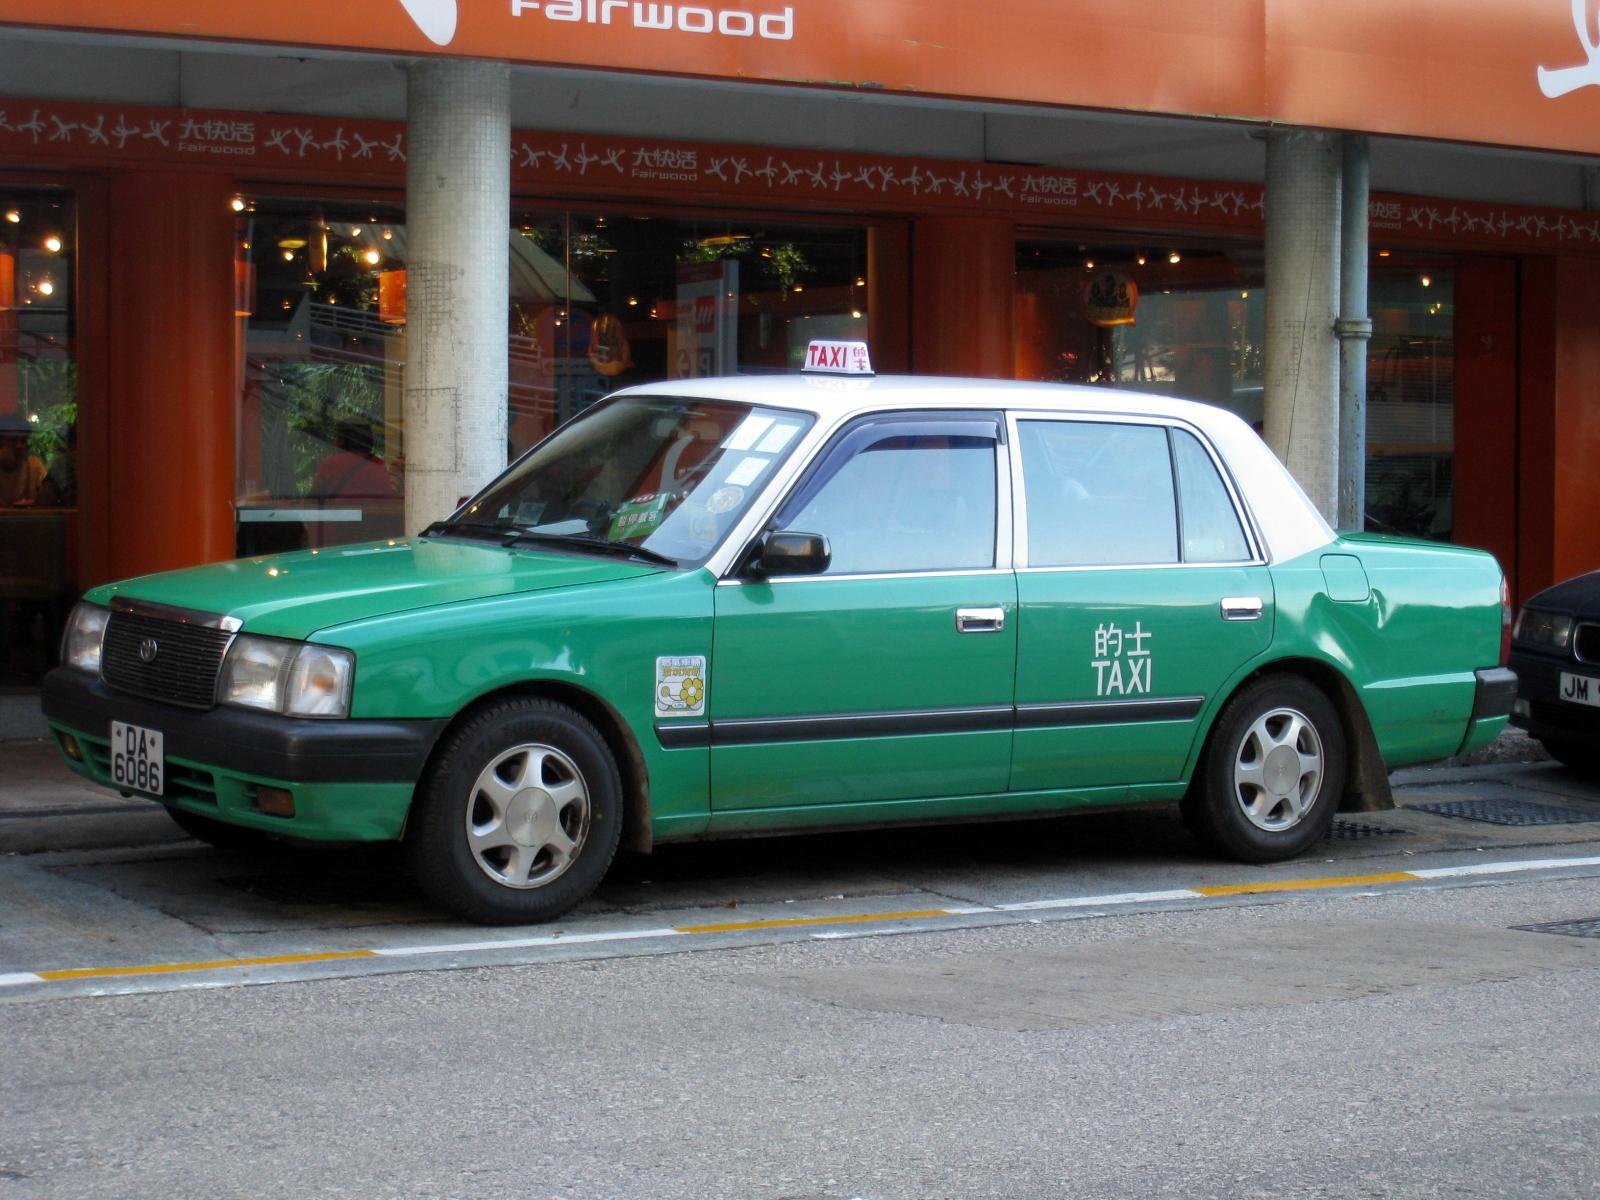 File:HK Toyota Comfort Green Taxi.jpg - Wikimedia Commons